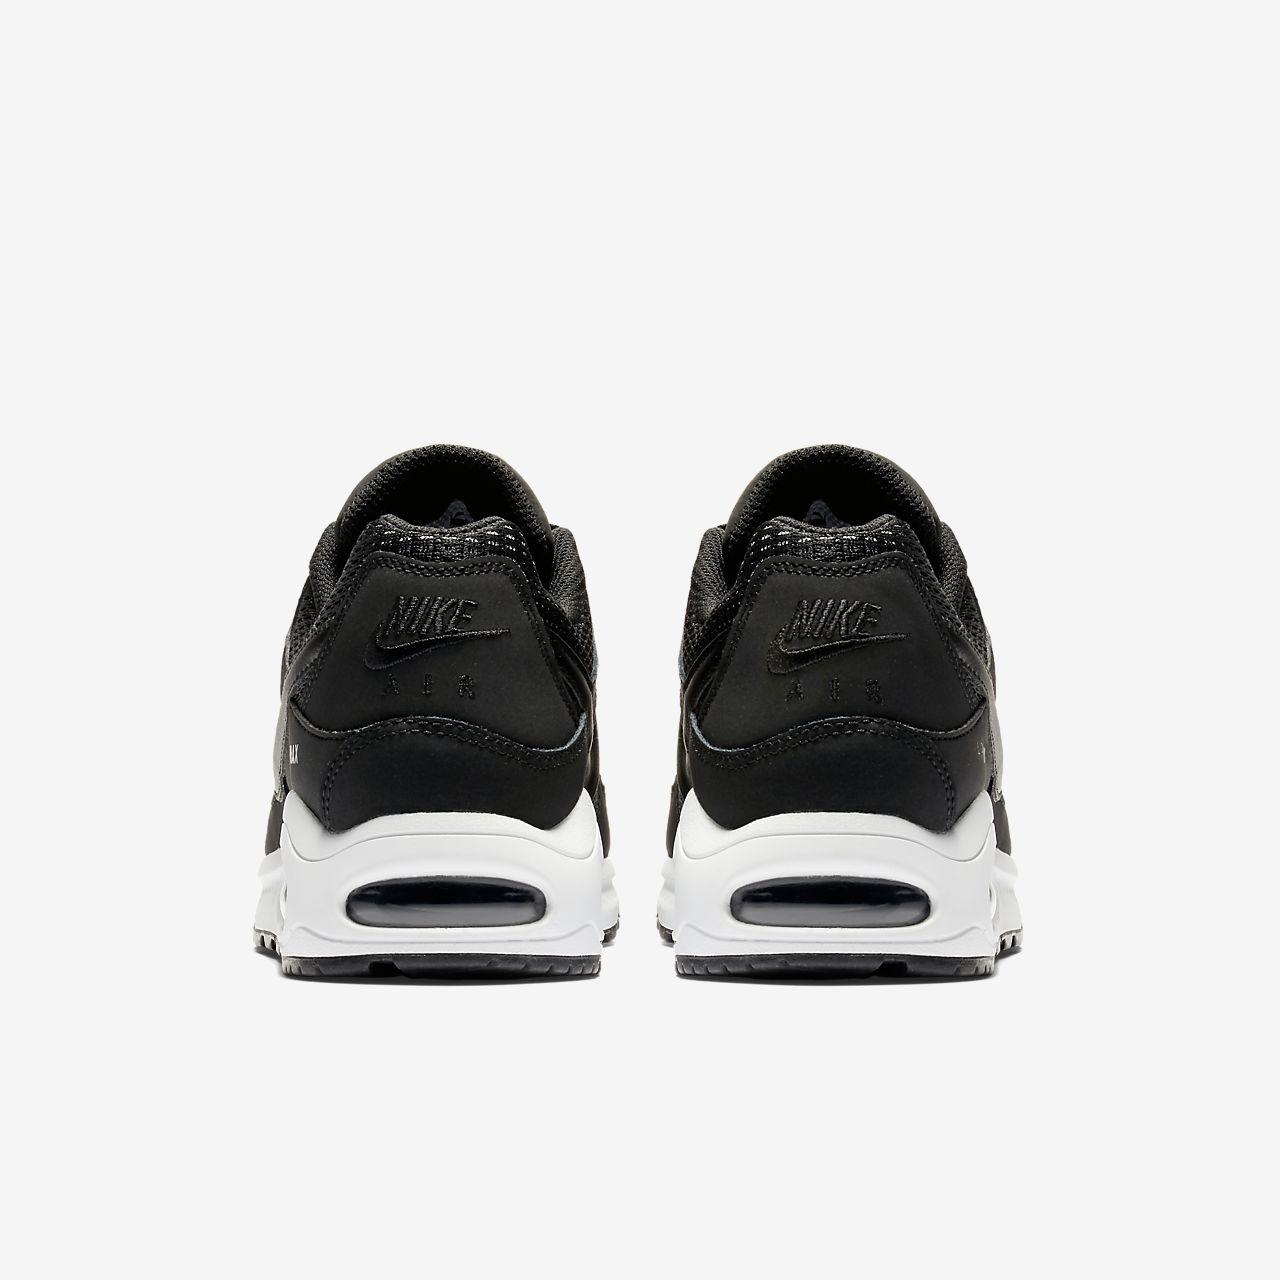 uk availability eec35 7e3ab Nike Air Max Command Damenschuh. Nike.com AT